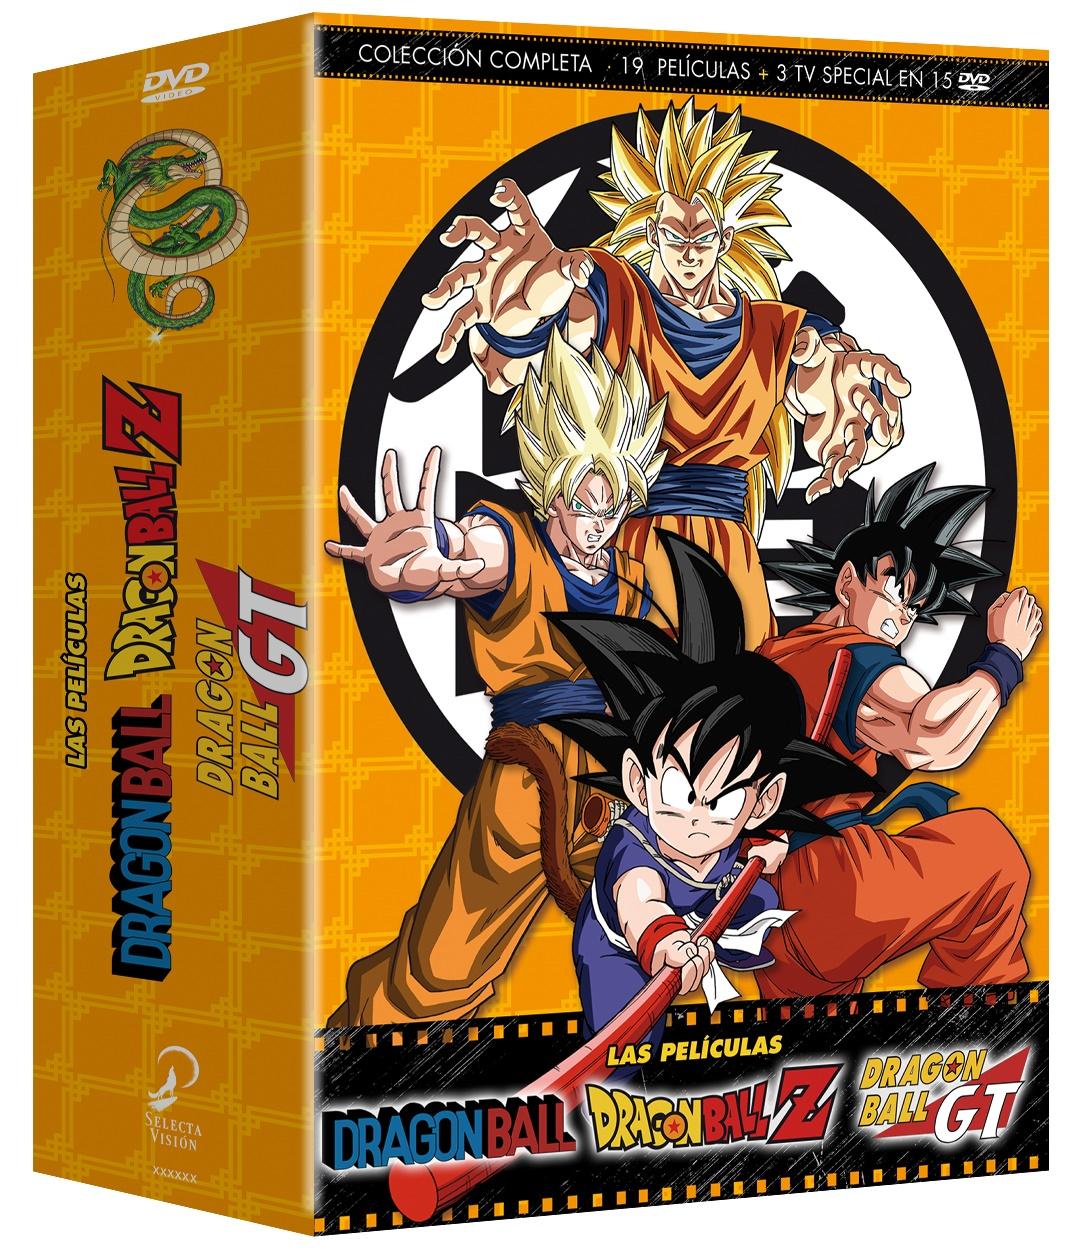 Dragon Ball, Z & GT, Las Películas - Colección completa